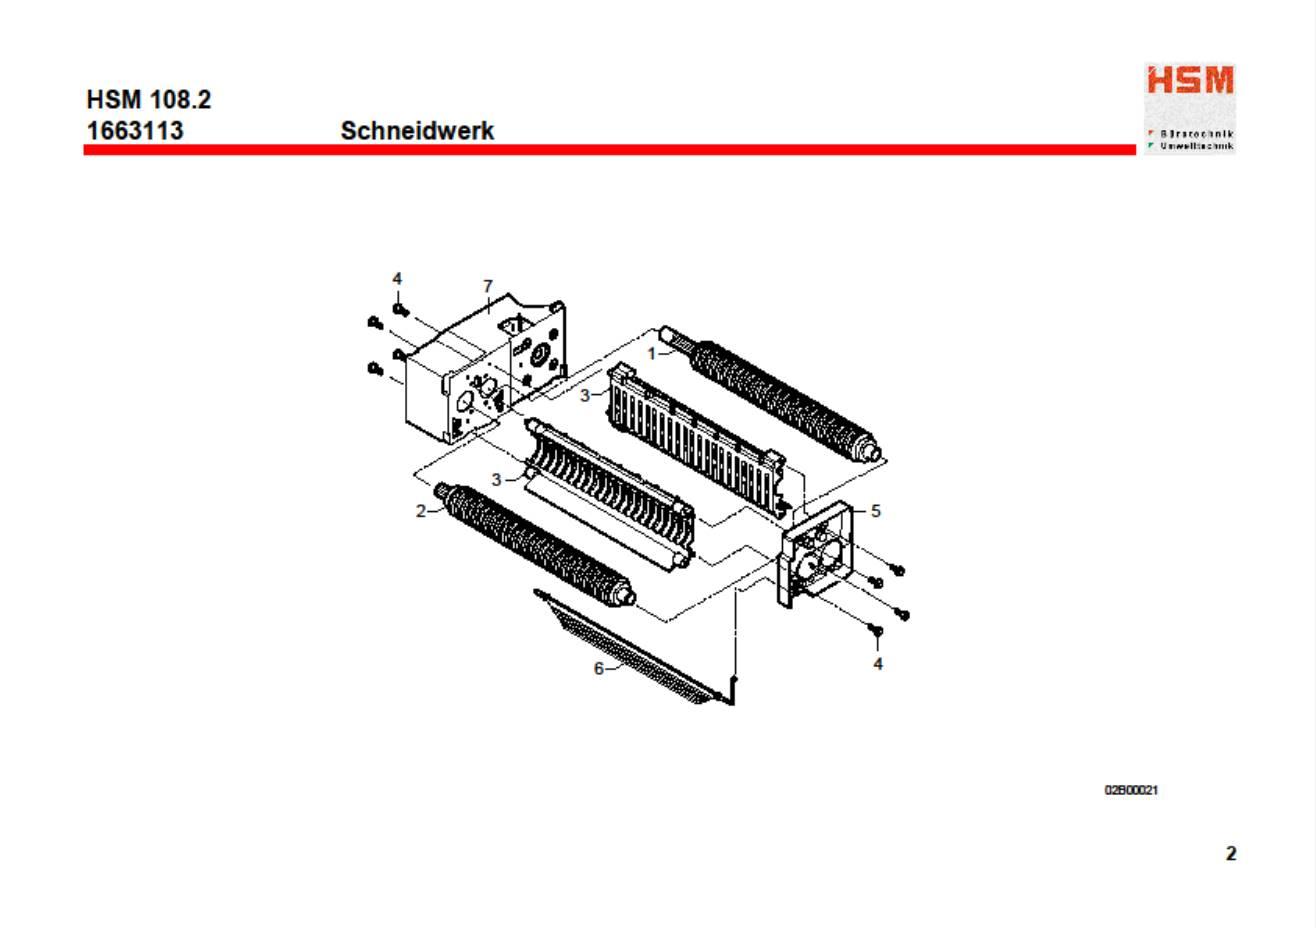 HSM Classic 108 SC Paper Shredder Oem Stripper Element New